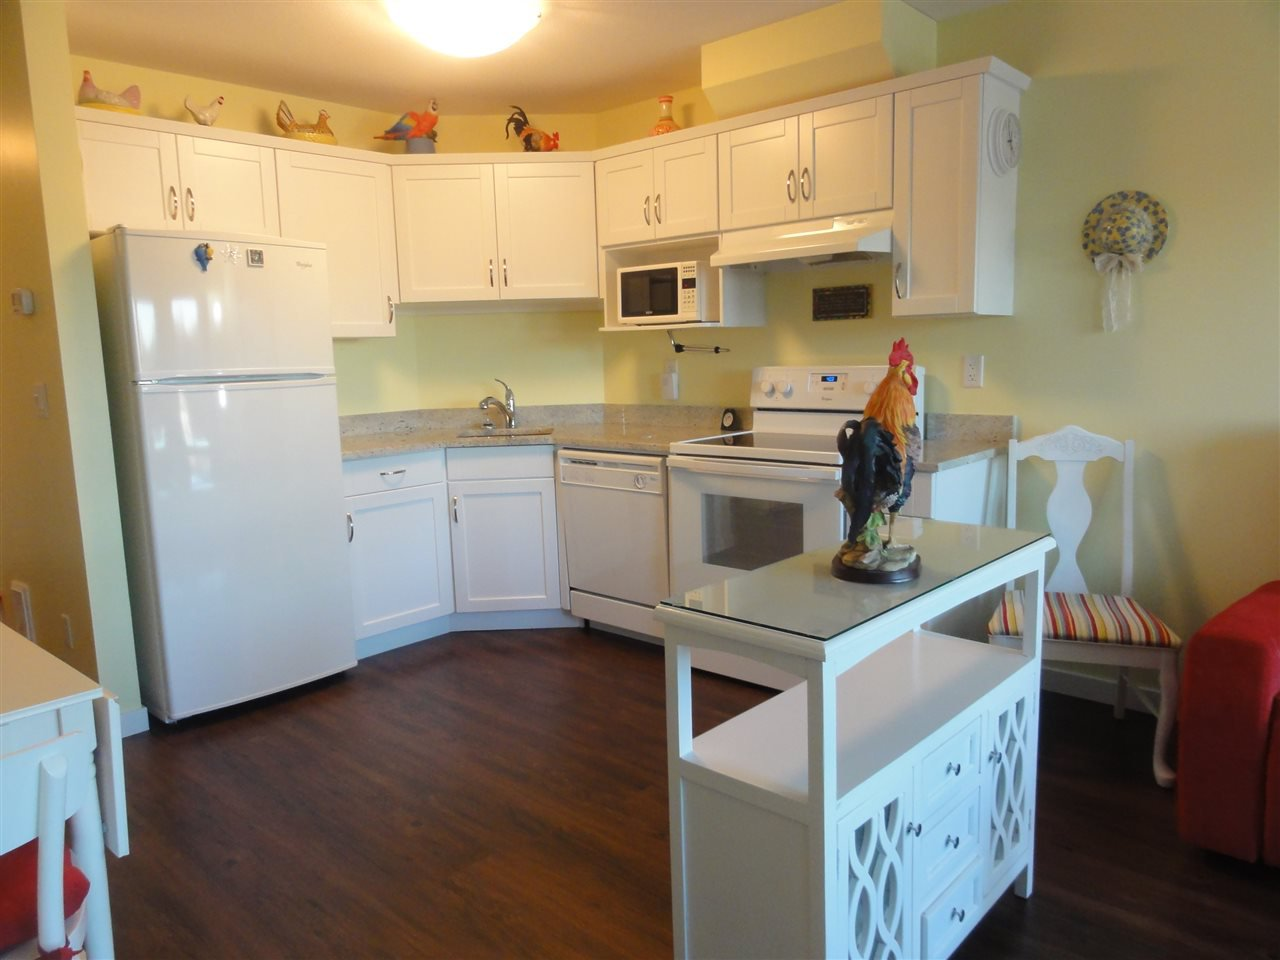 "Photo 2: Photos: 431 22323 48 Avenue in Langley: Murrayville Condo for sale in ""AVALON GARDENS"" : MLS®# R2134591"